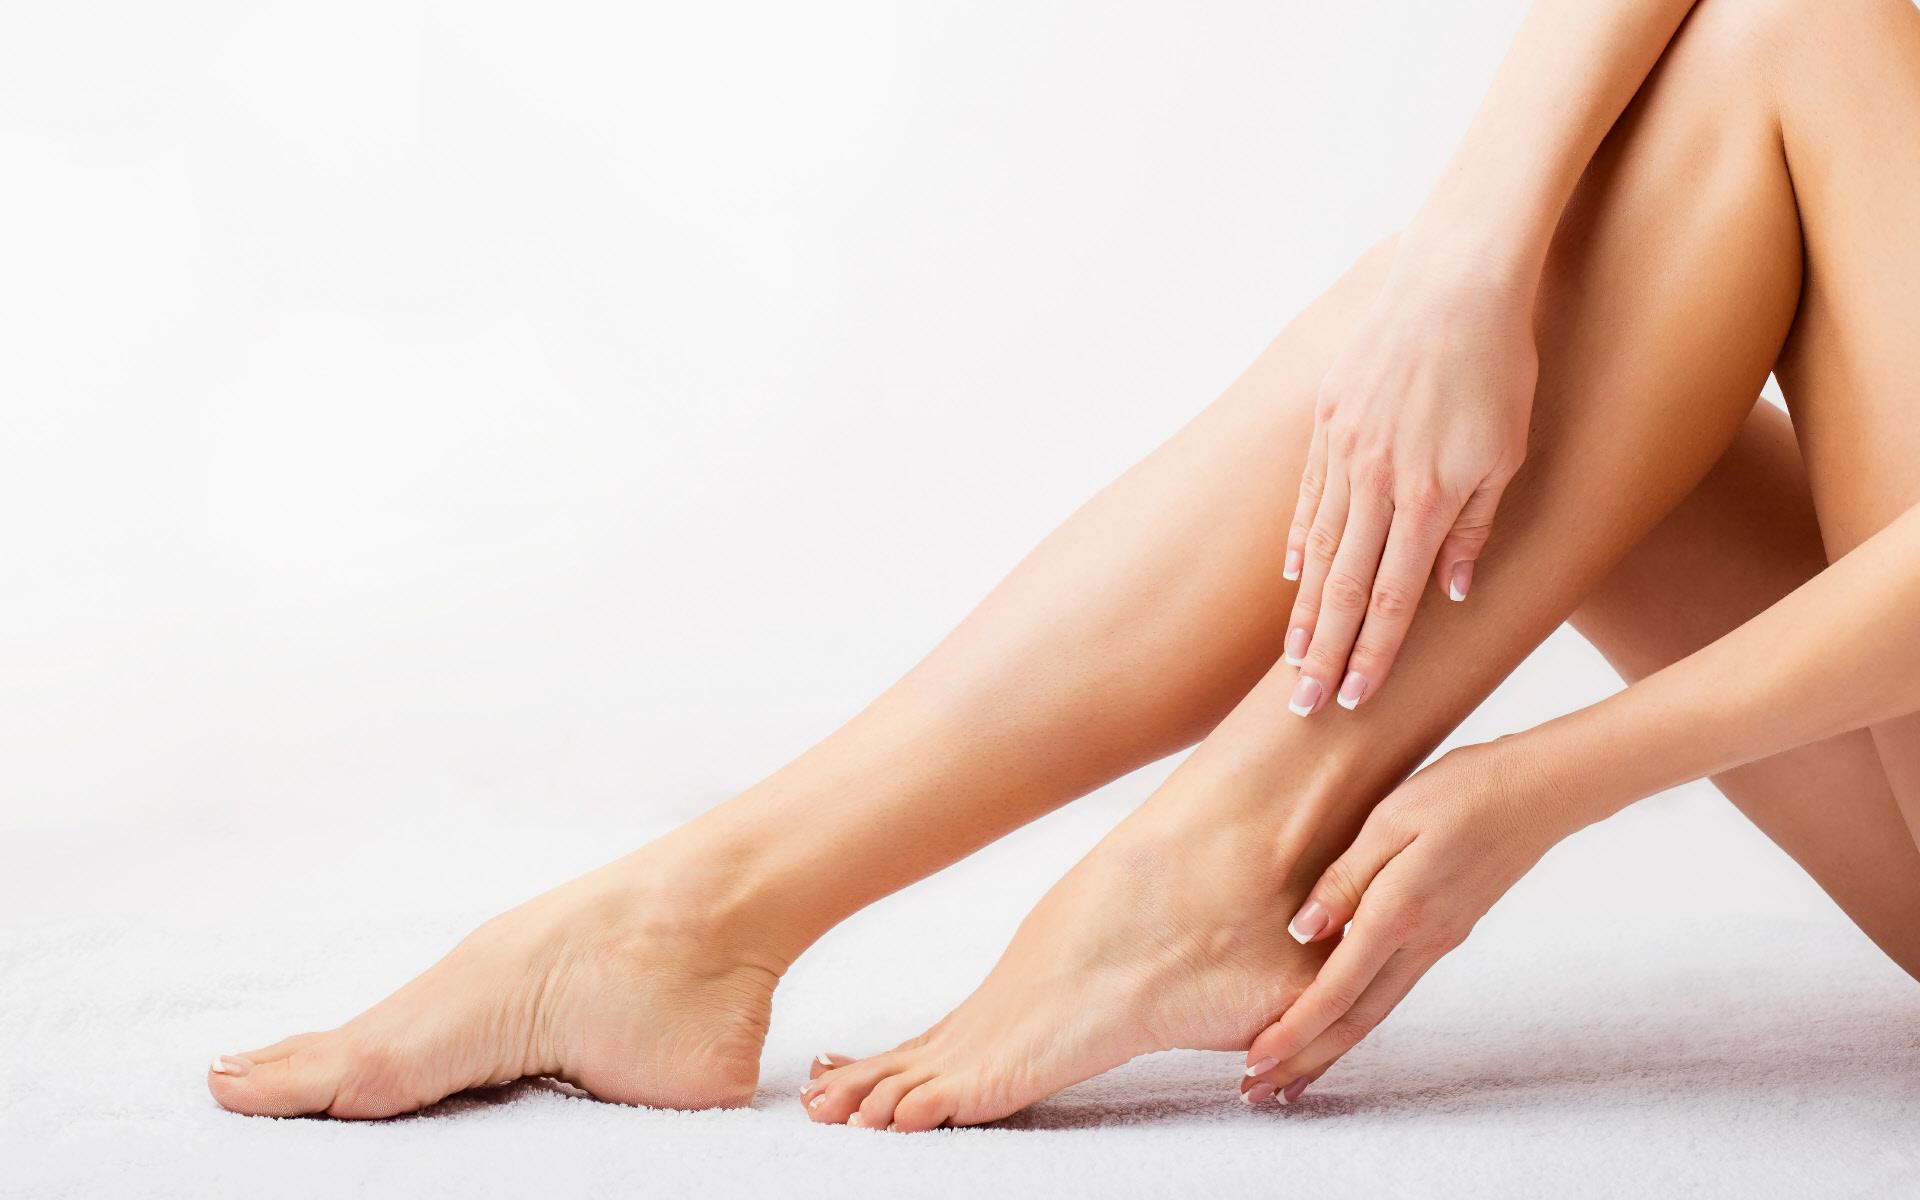 Ultra Beauty Salon in Whyteleafe - IPL Treatments